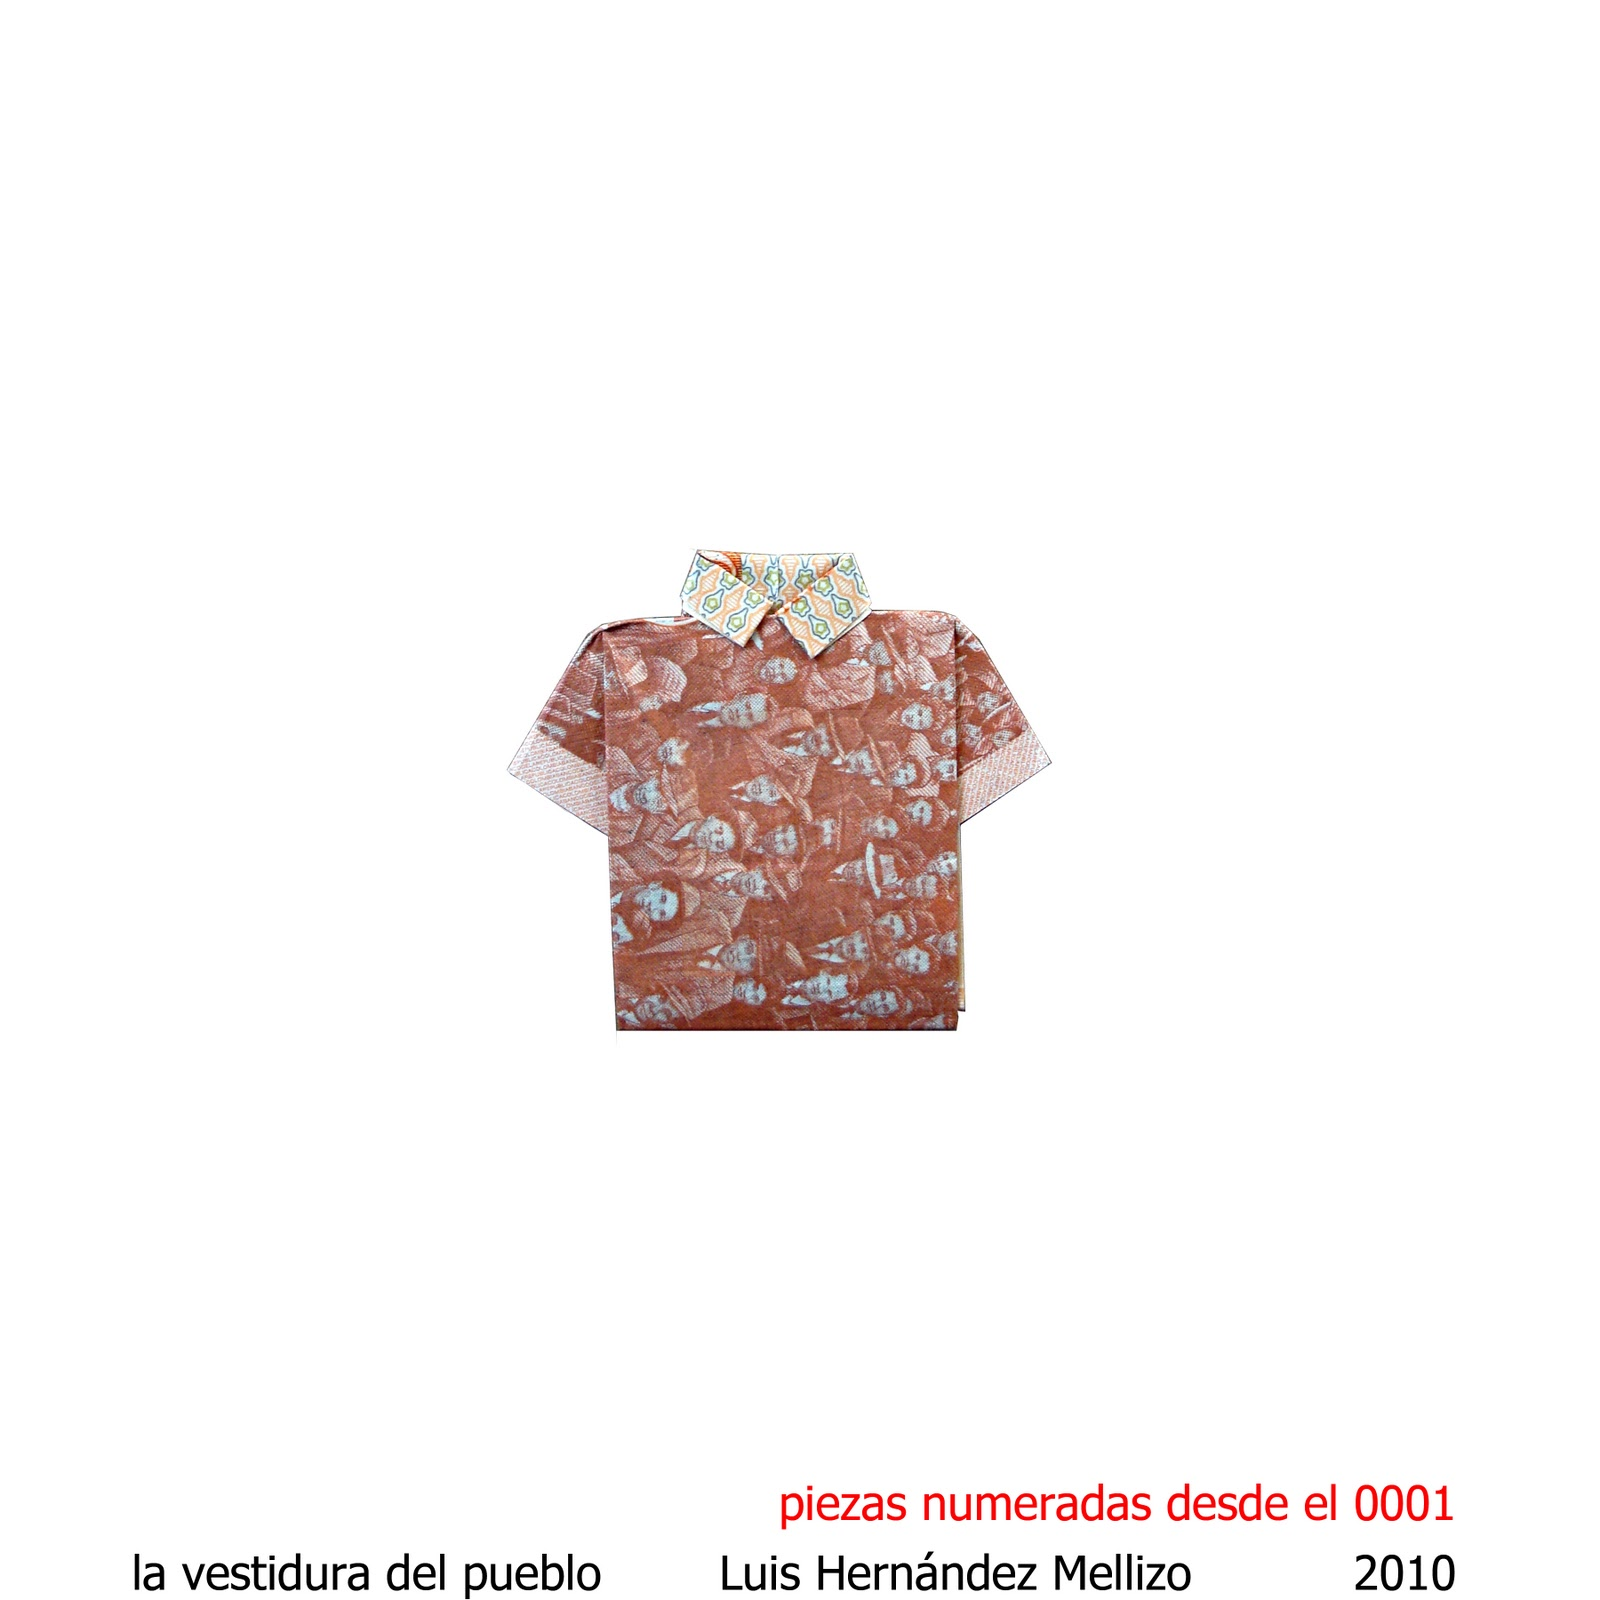 http://3.bp.blogspot.com/_yGrU45hPKYk/TKFP3LJ32pI/AAAAAAAAAk0/0Ficm9KoGxU/s1600/la+vestidura+del+pueblo.jpg